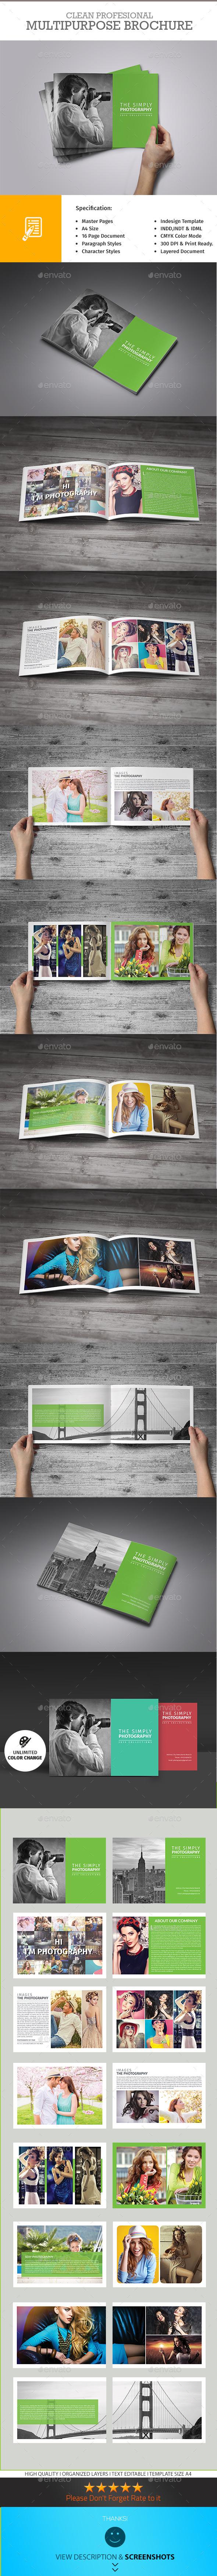 GraphicRiver Photography Portfolio Brochure 10138312